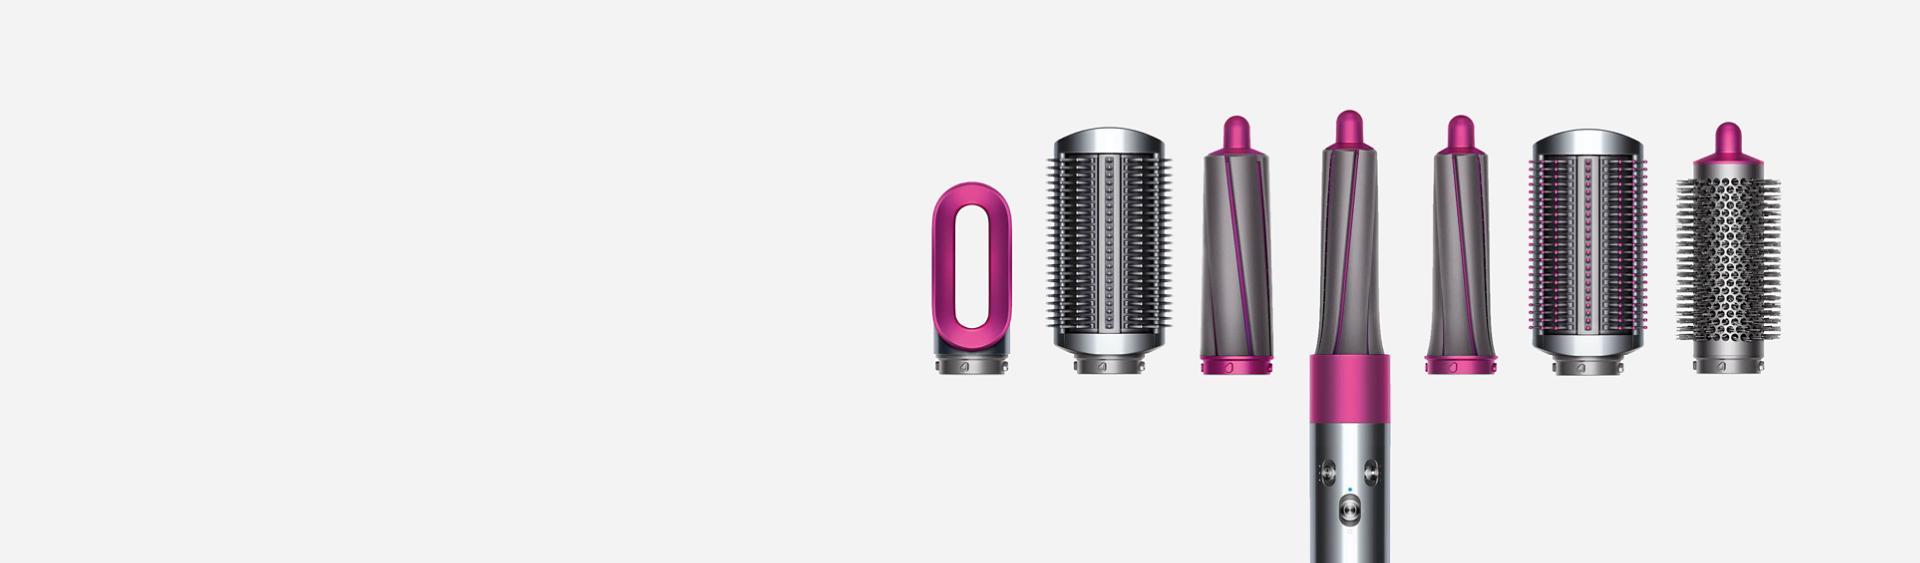 Range of Dyson Airwrap™ styler attachments